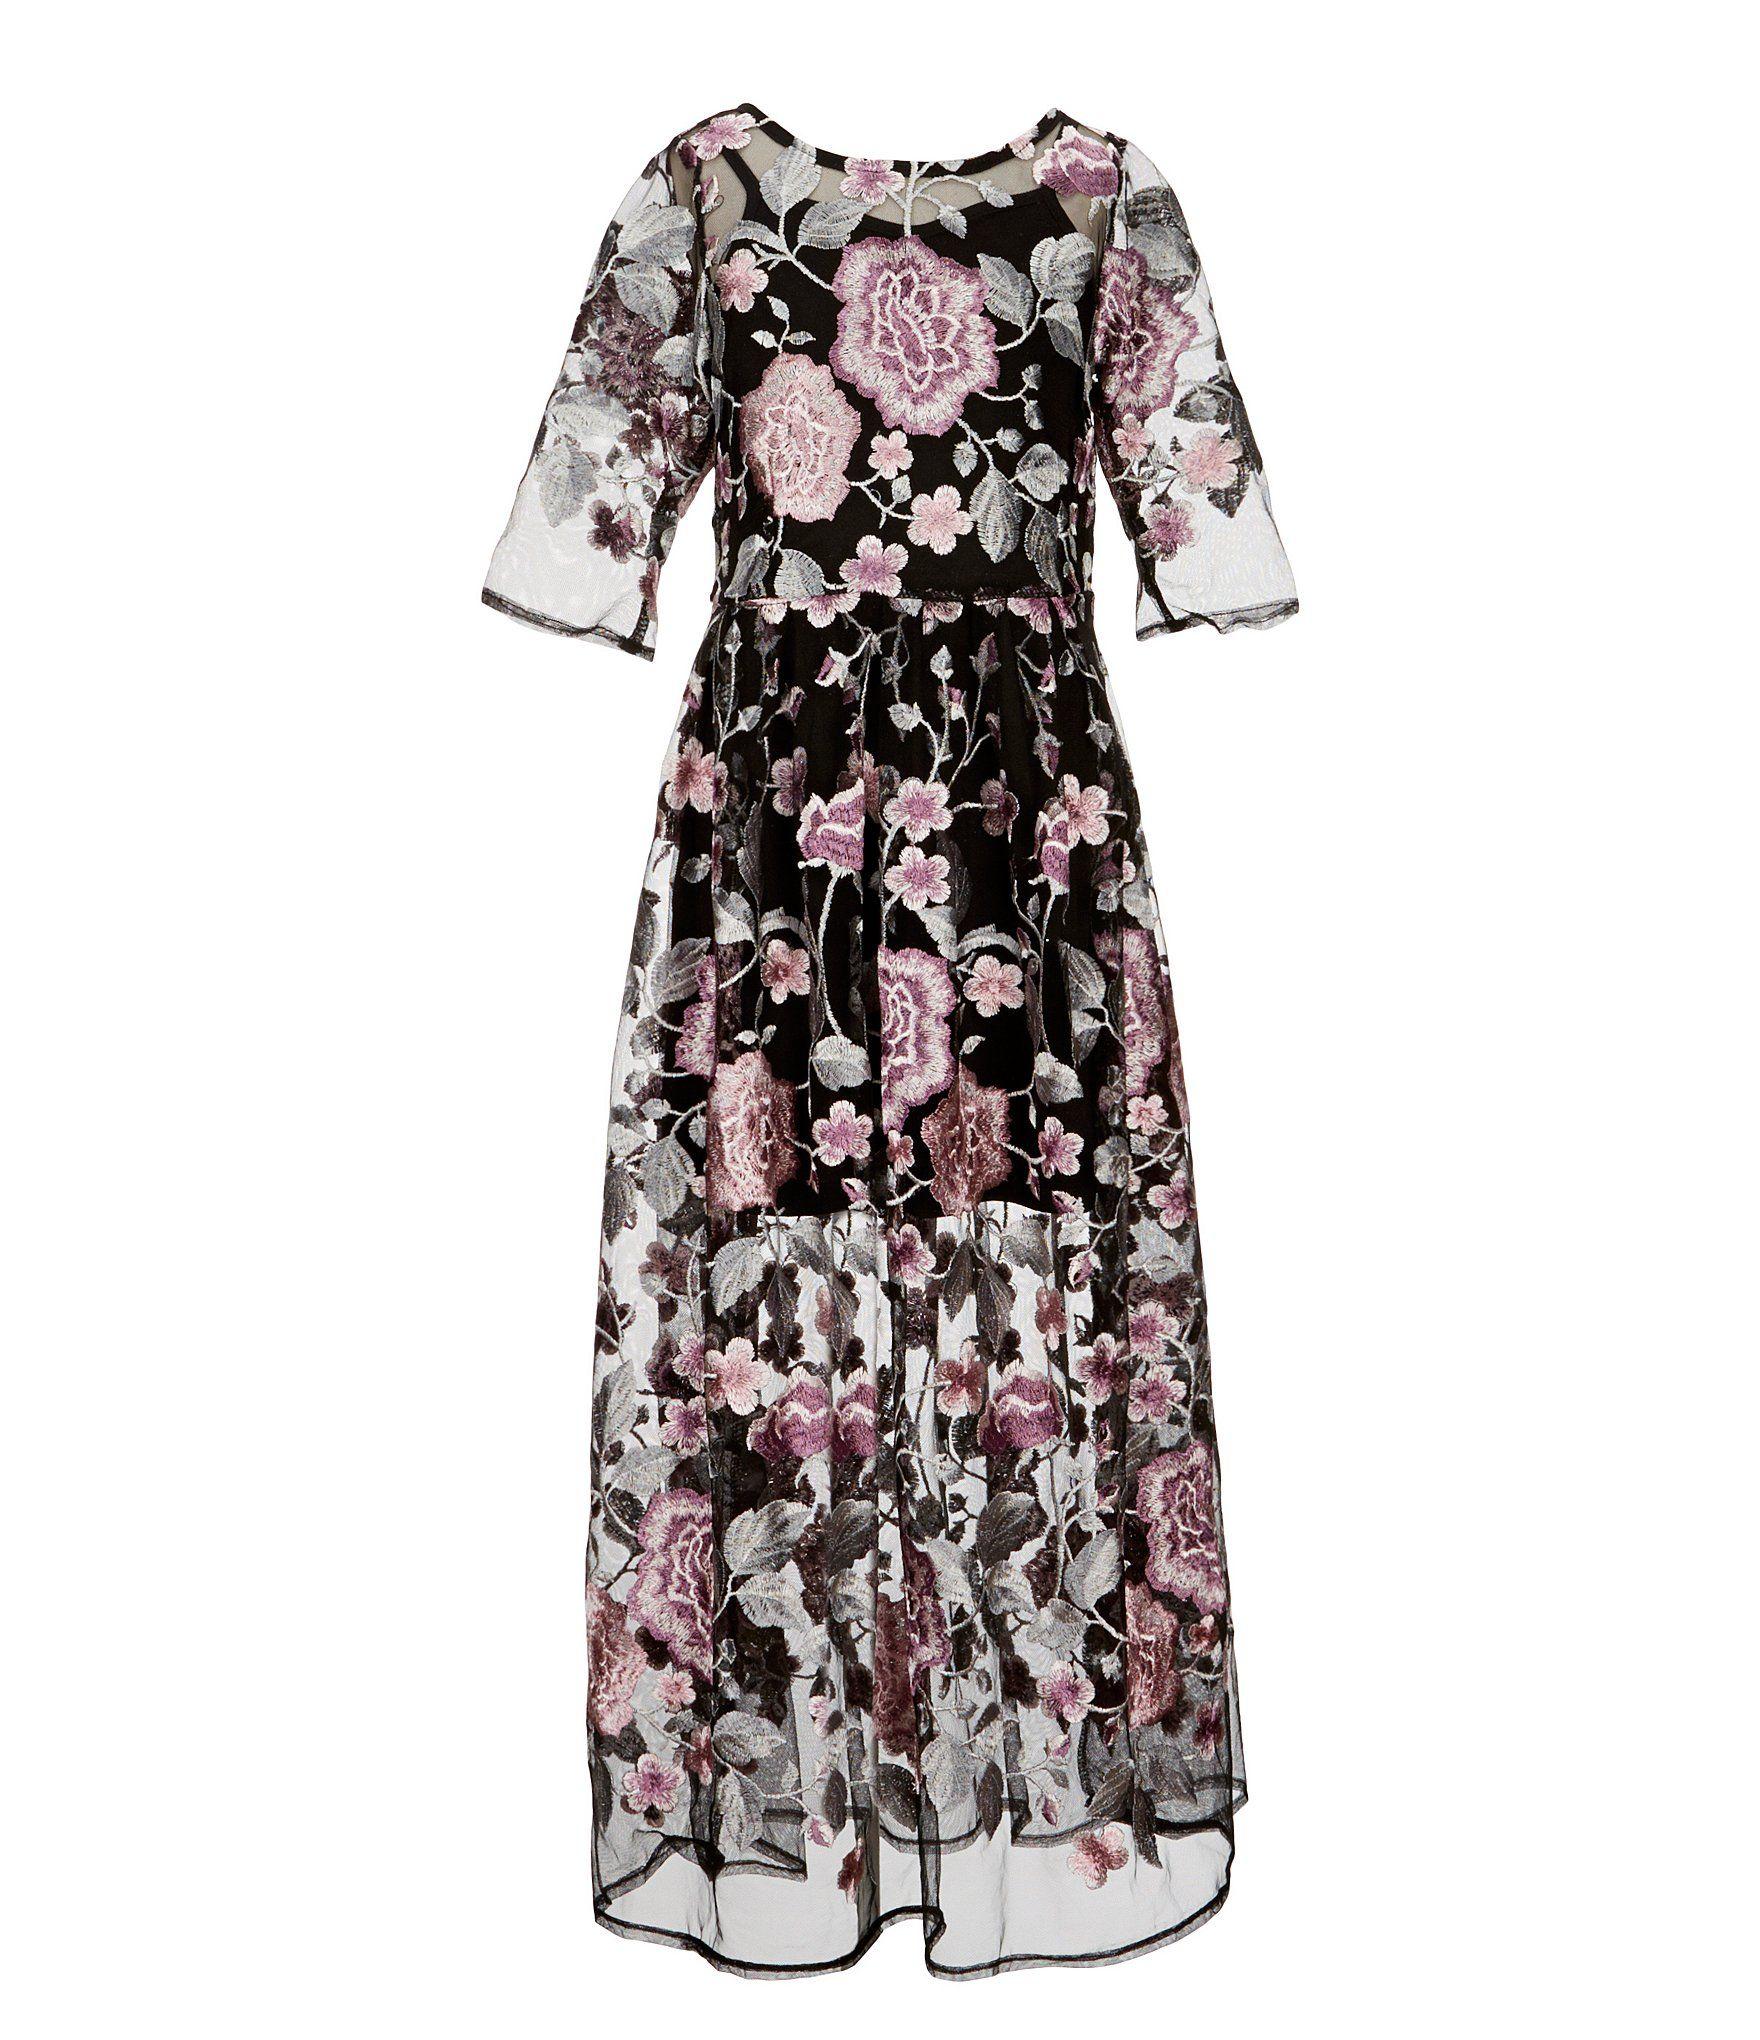 f36780ea670 Shop for Pippa   Julie Big Girls 7-14 Floral-Embroidered Maxi Dress ...